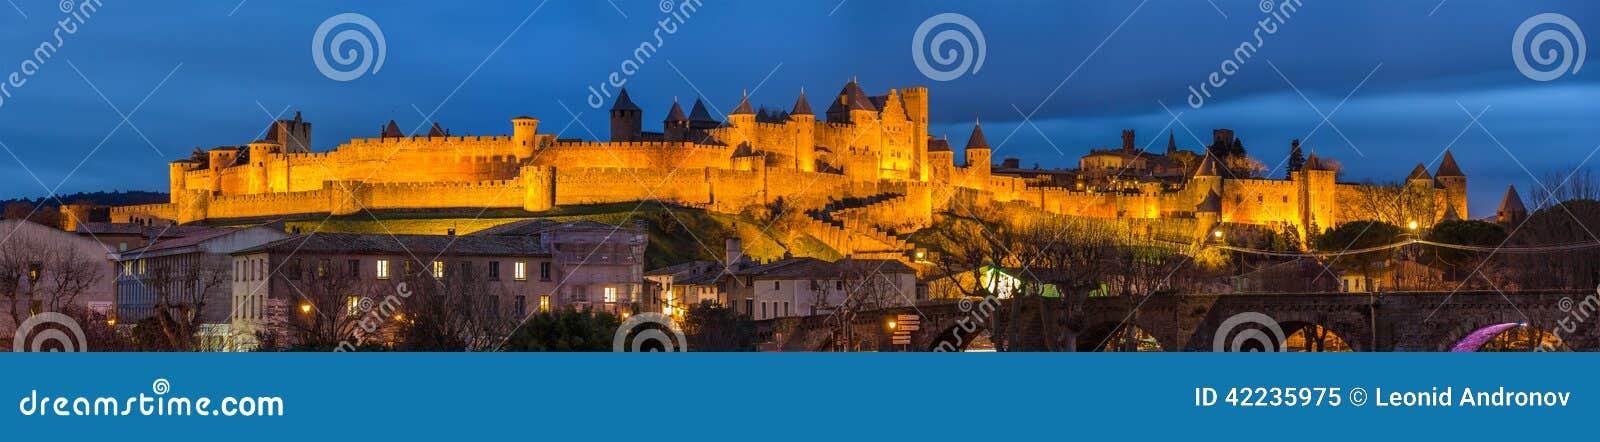 Avondpanorama van de vesting van Carcassonne, Frankrijk